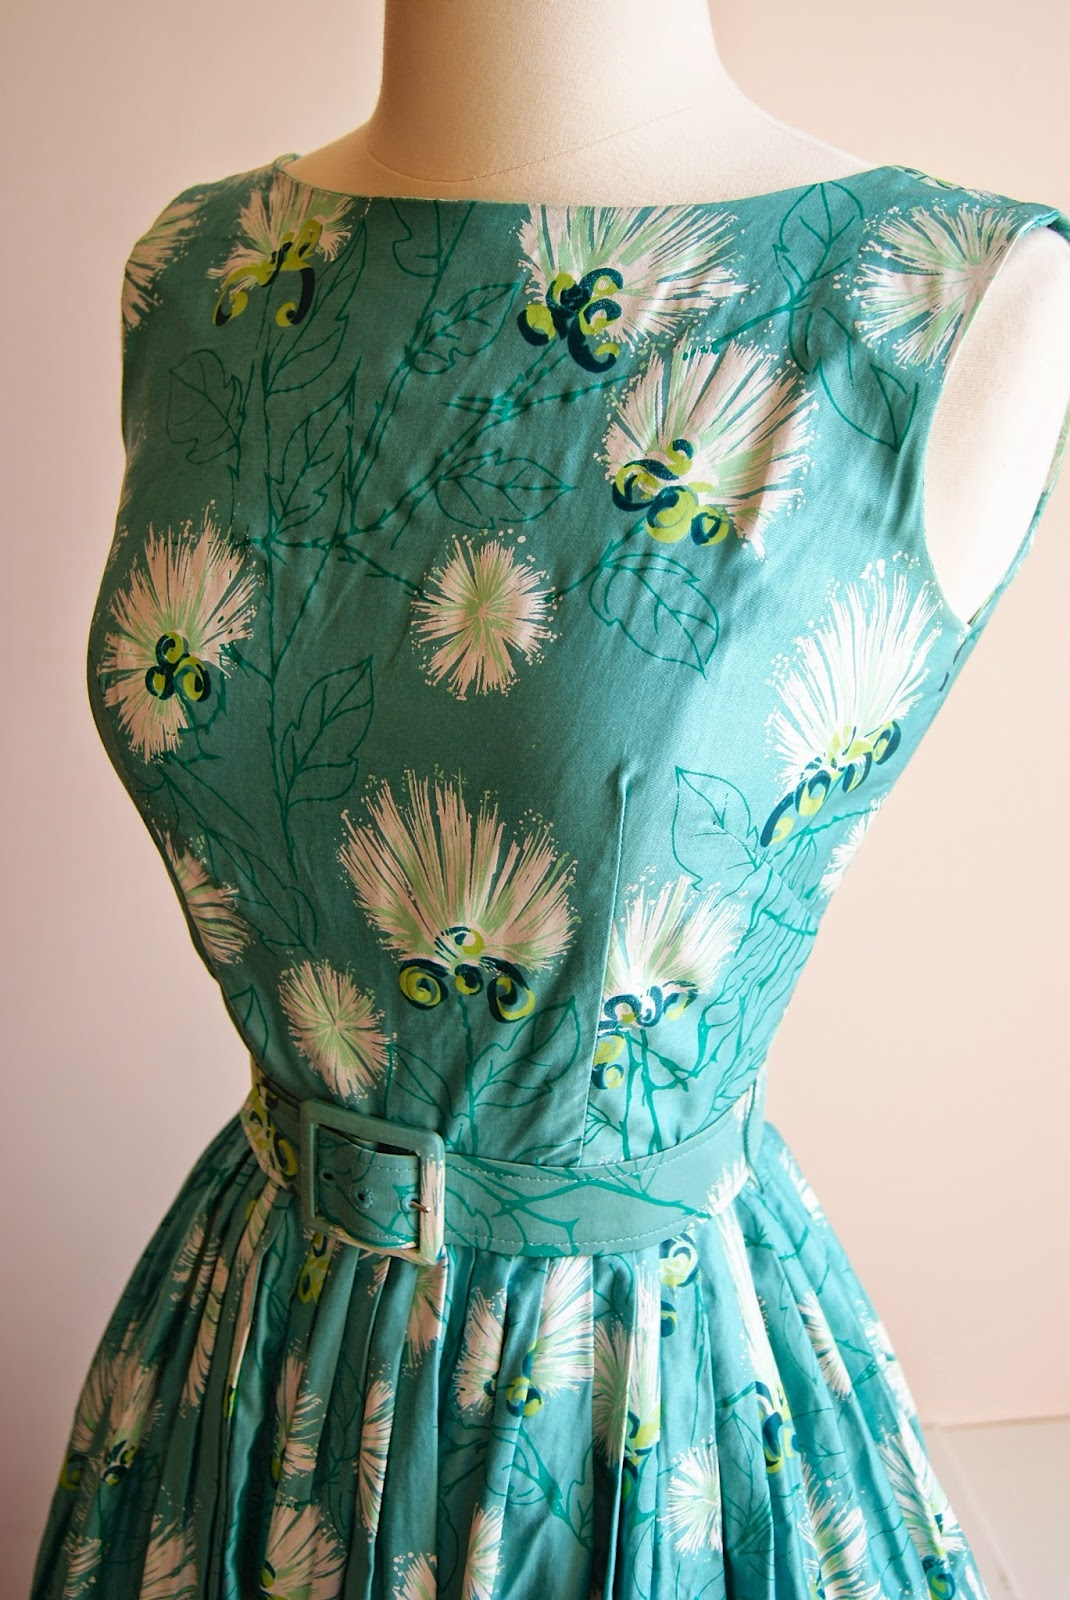 Xtabay Vintage Clothing Boutique - Portland, Oregon: April 2014